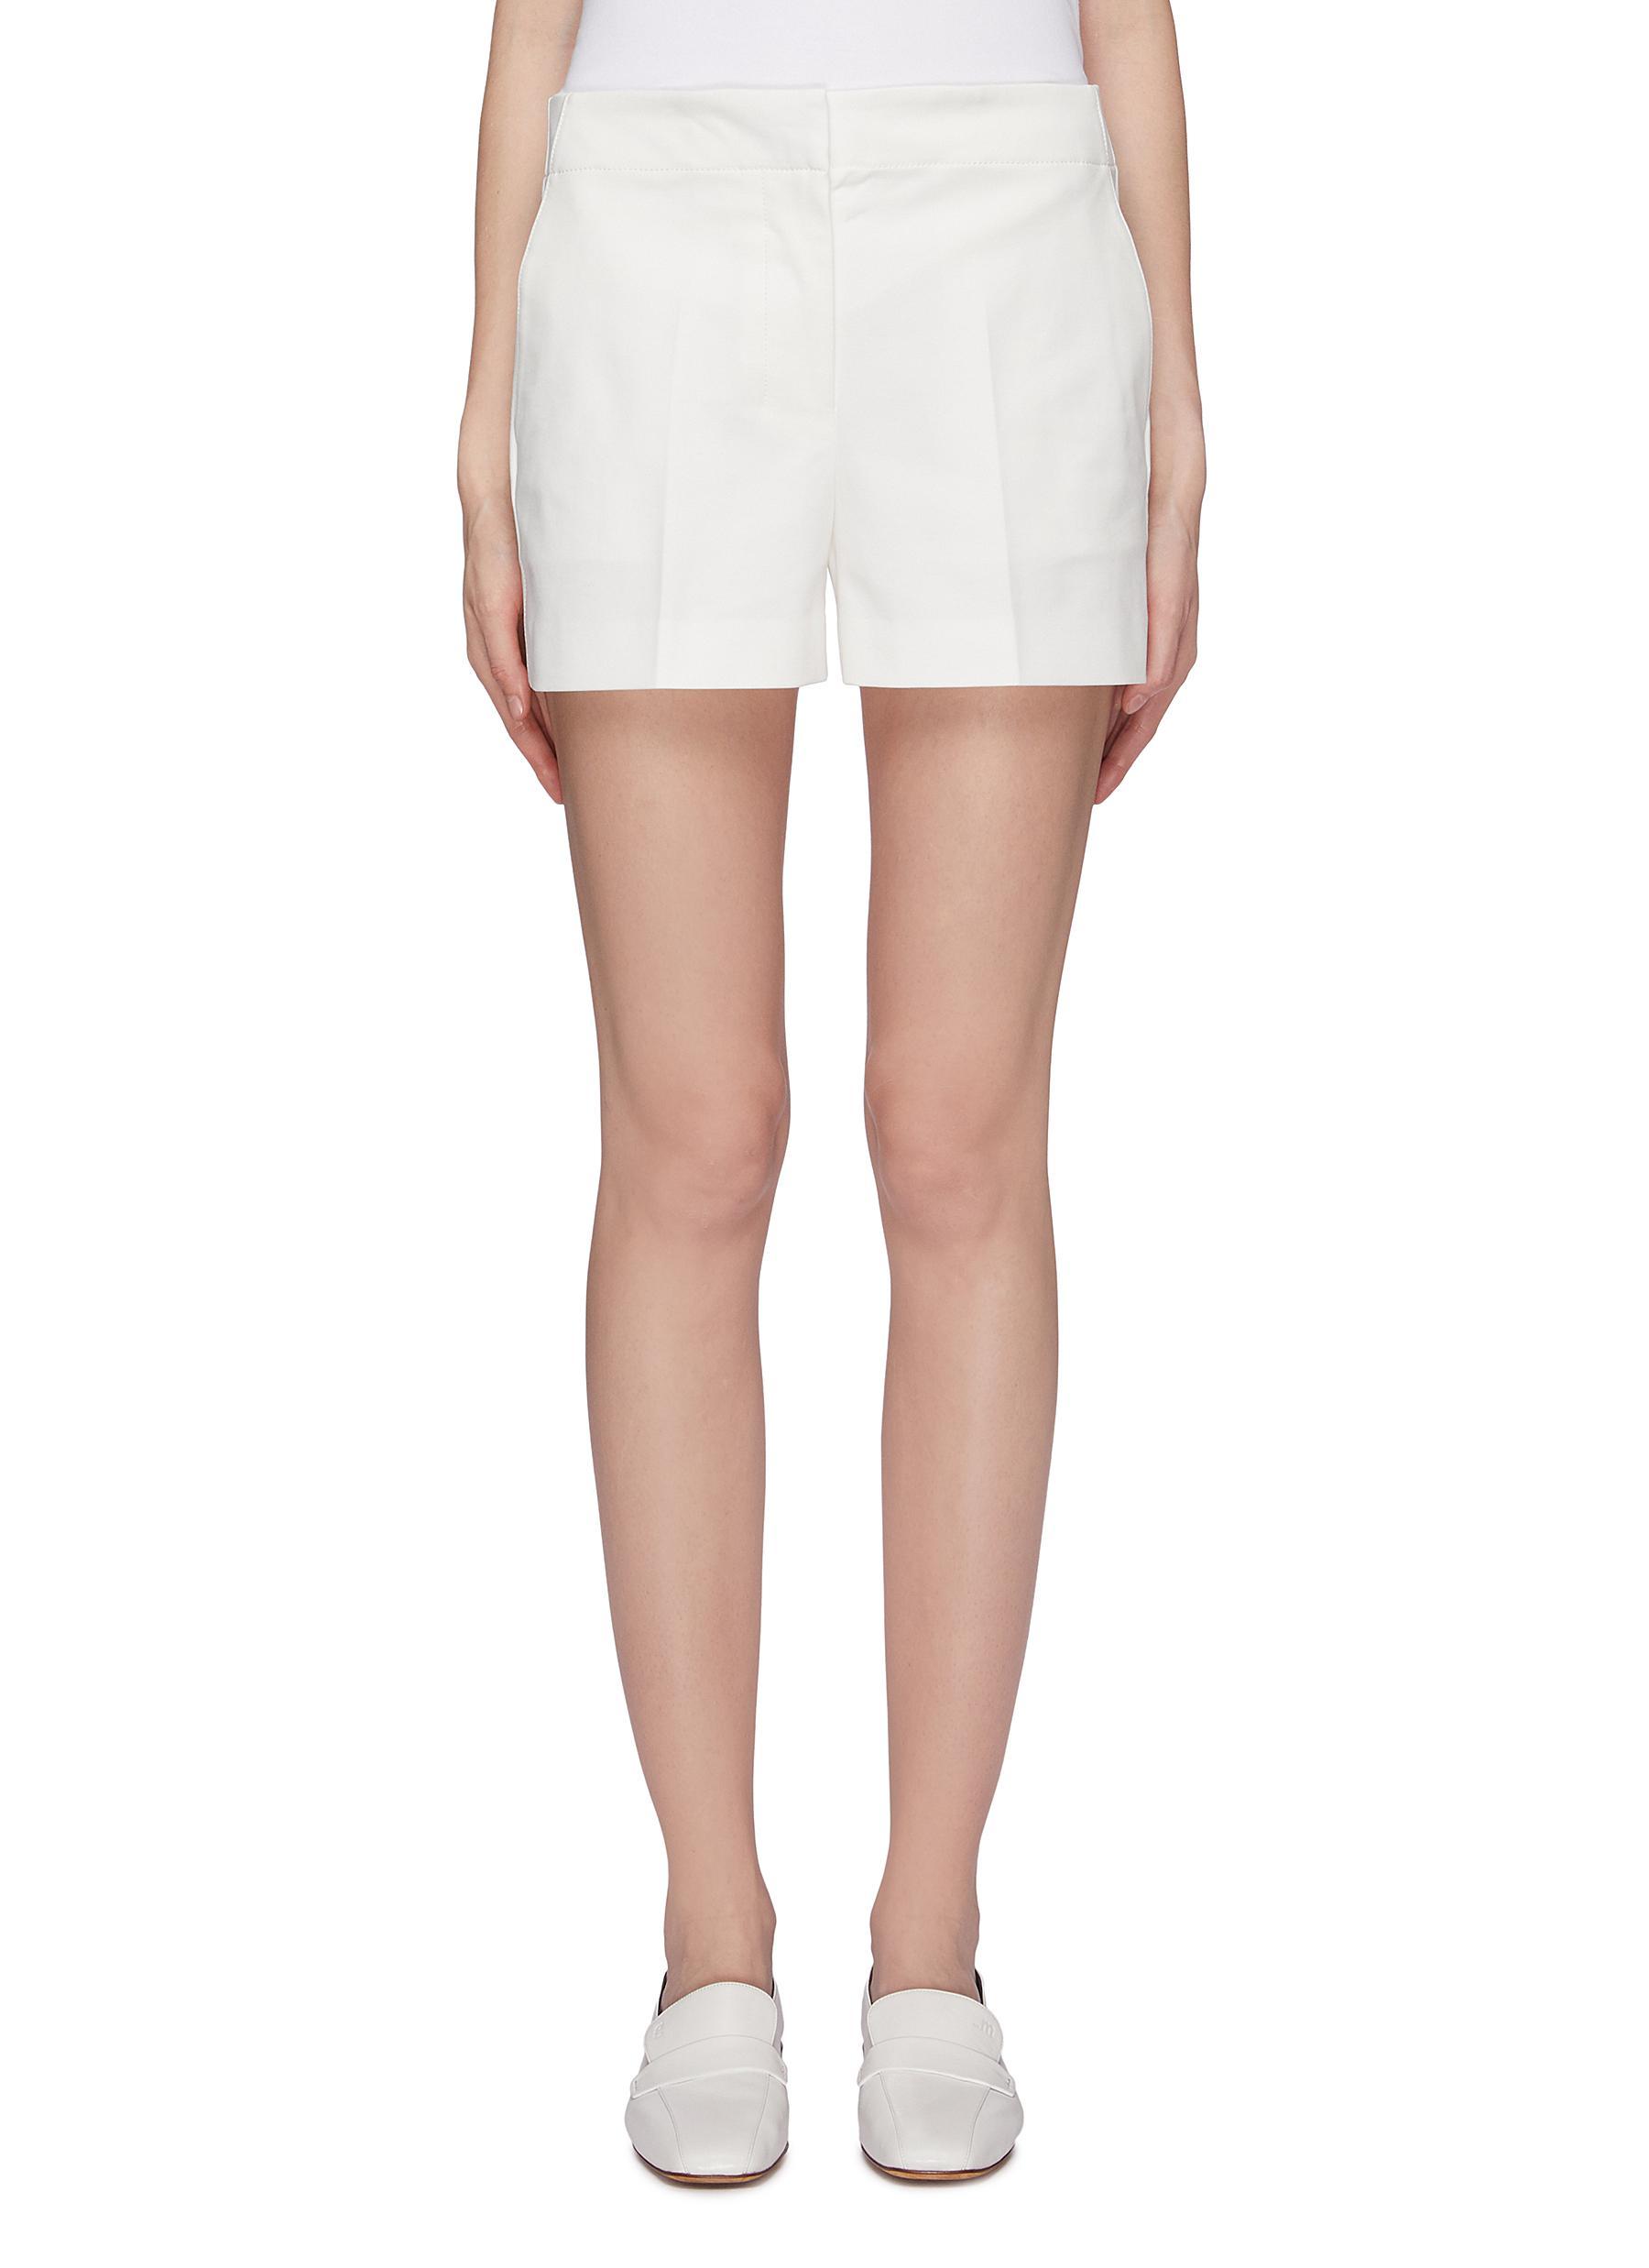 Mini shorts by Theory